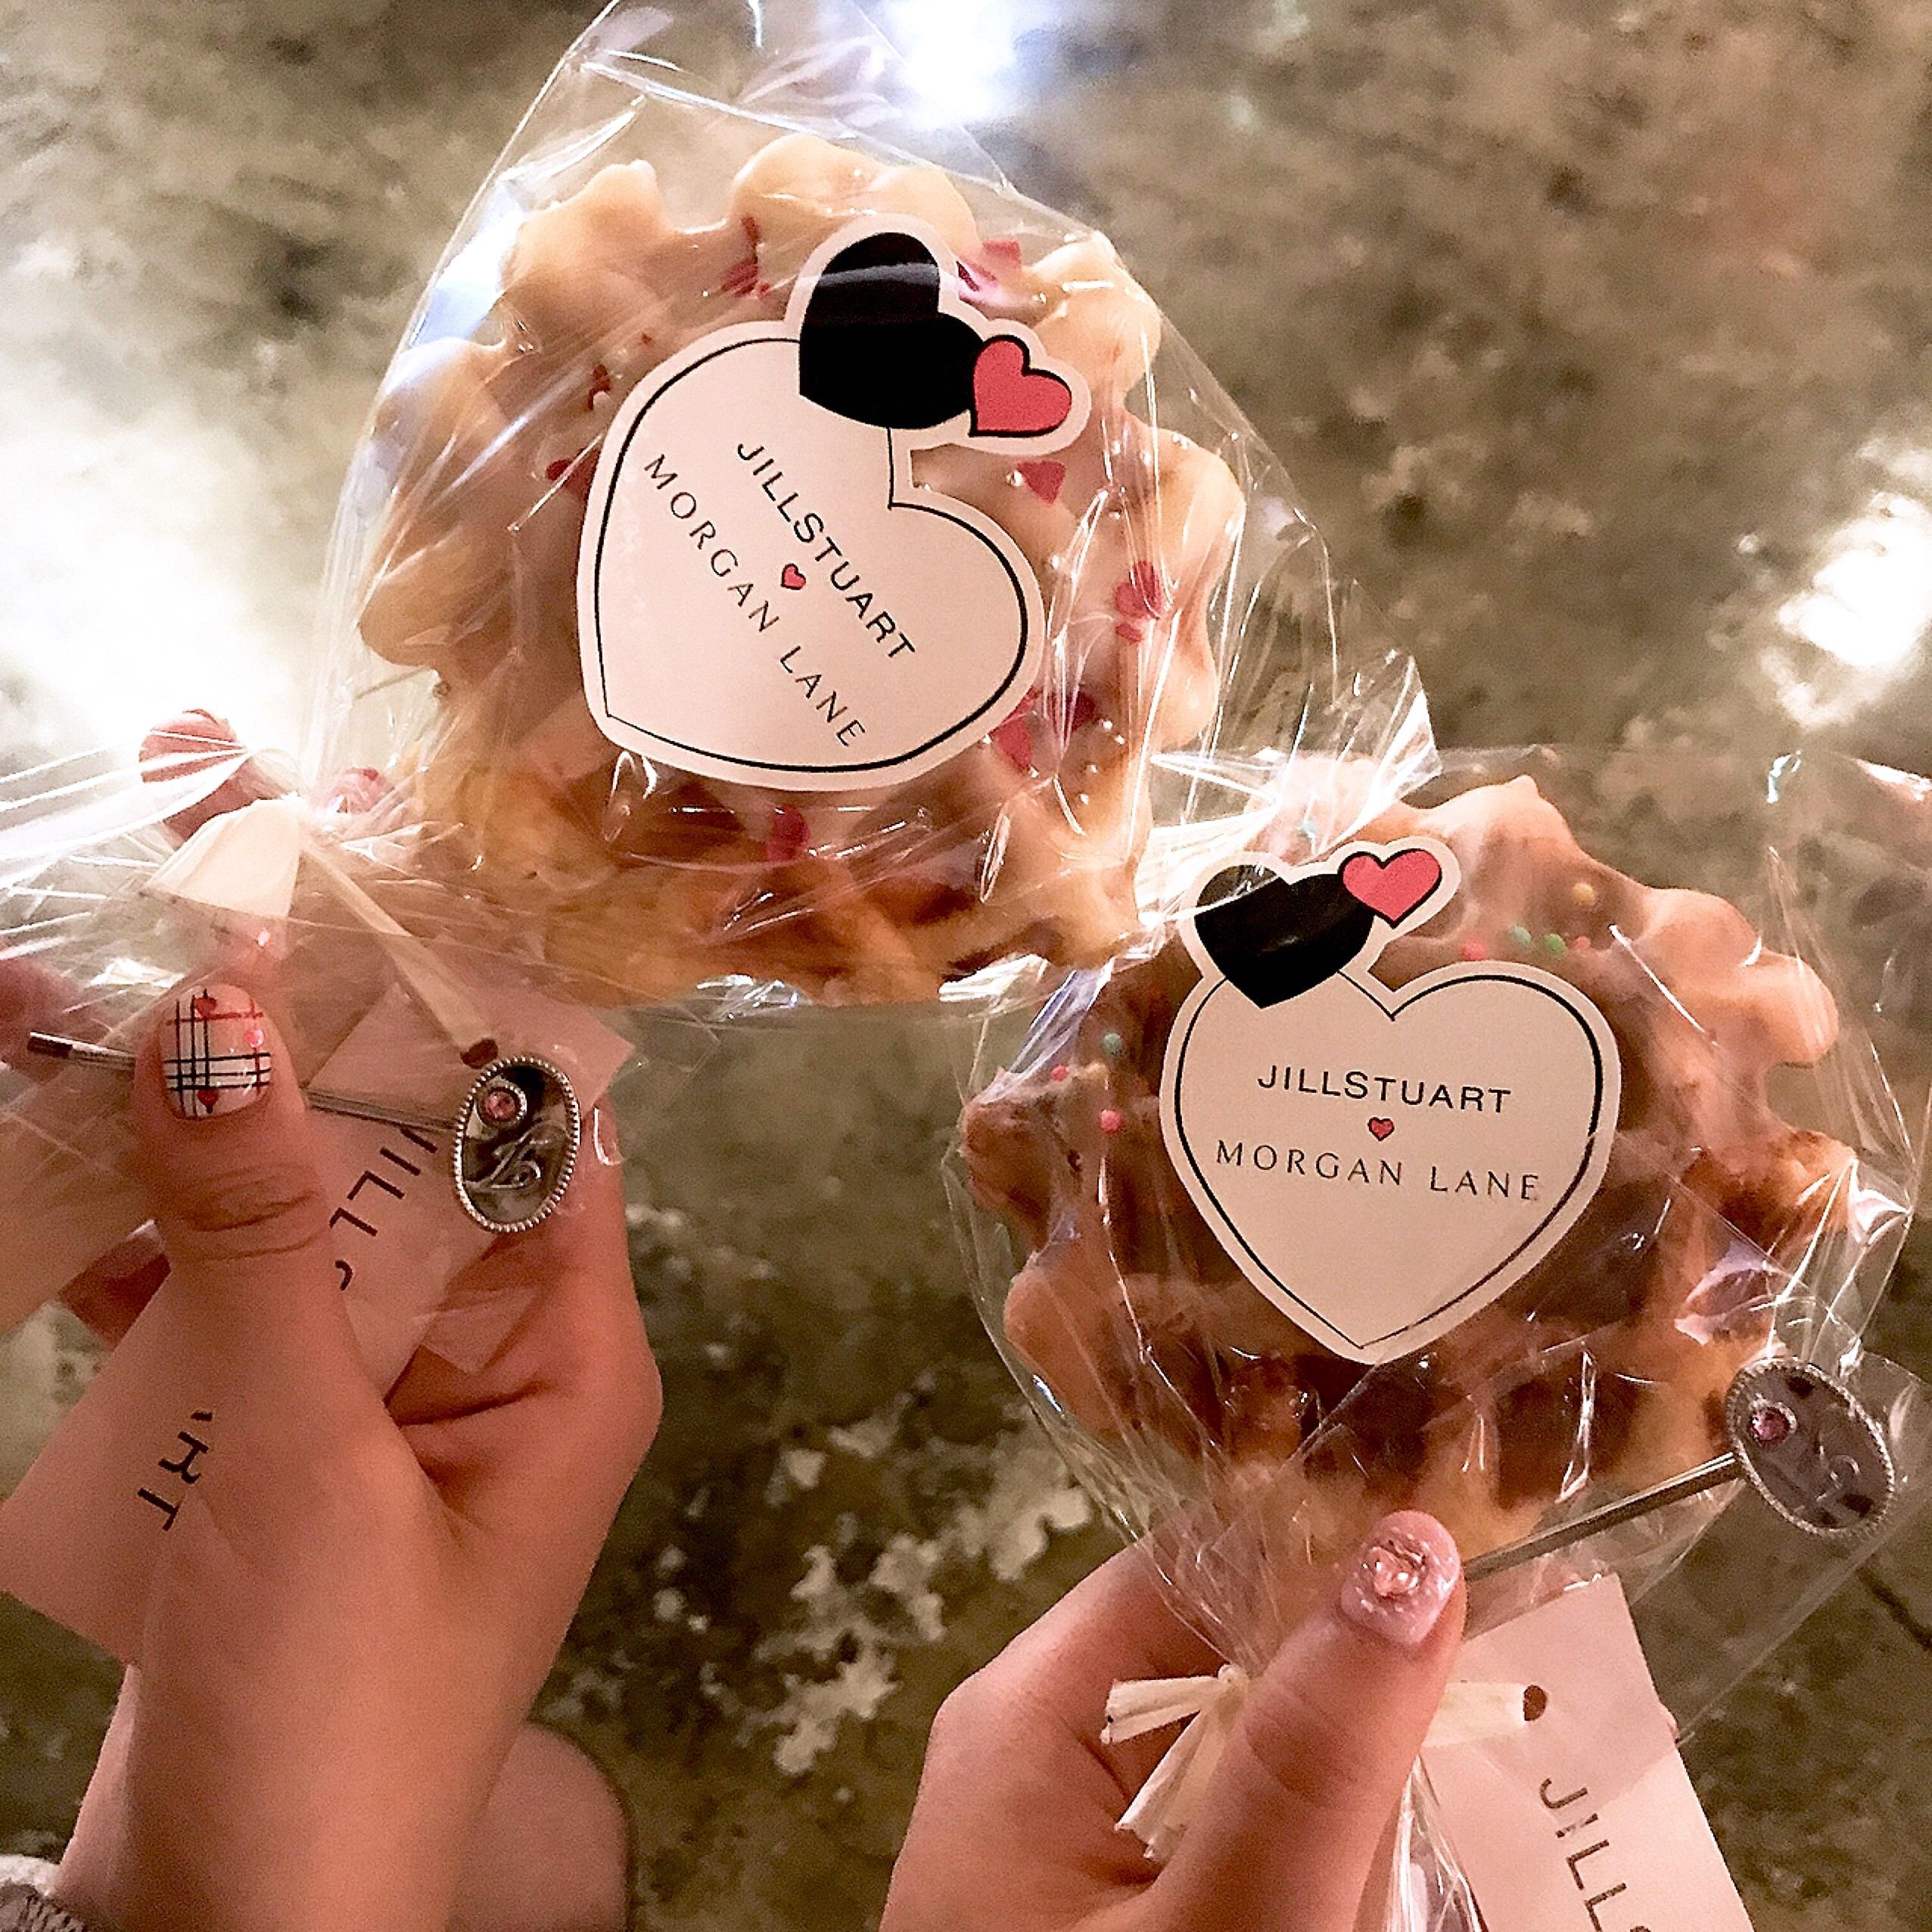 Vol.29♡ 3日間限定!JILL STUARTのパジャマパーティー?!_1_7